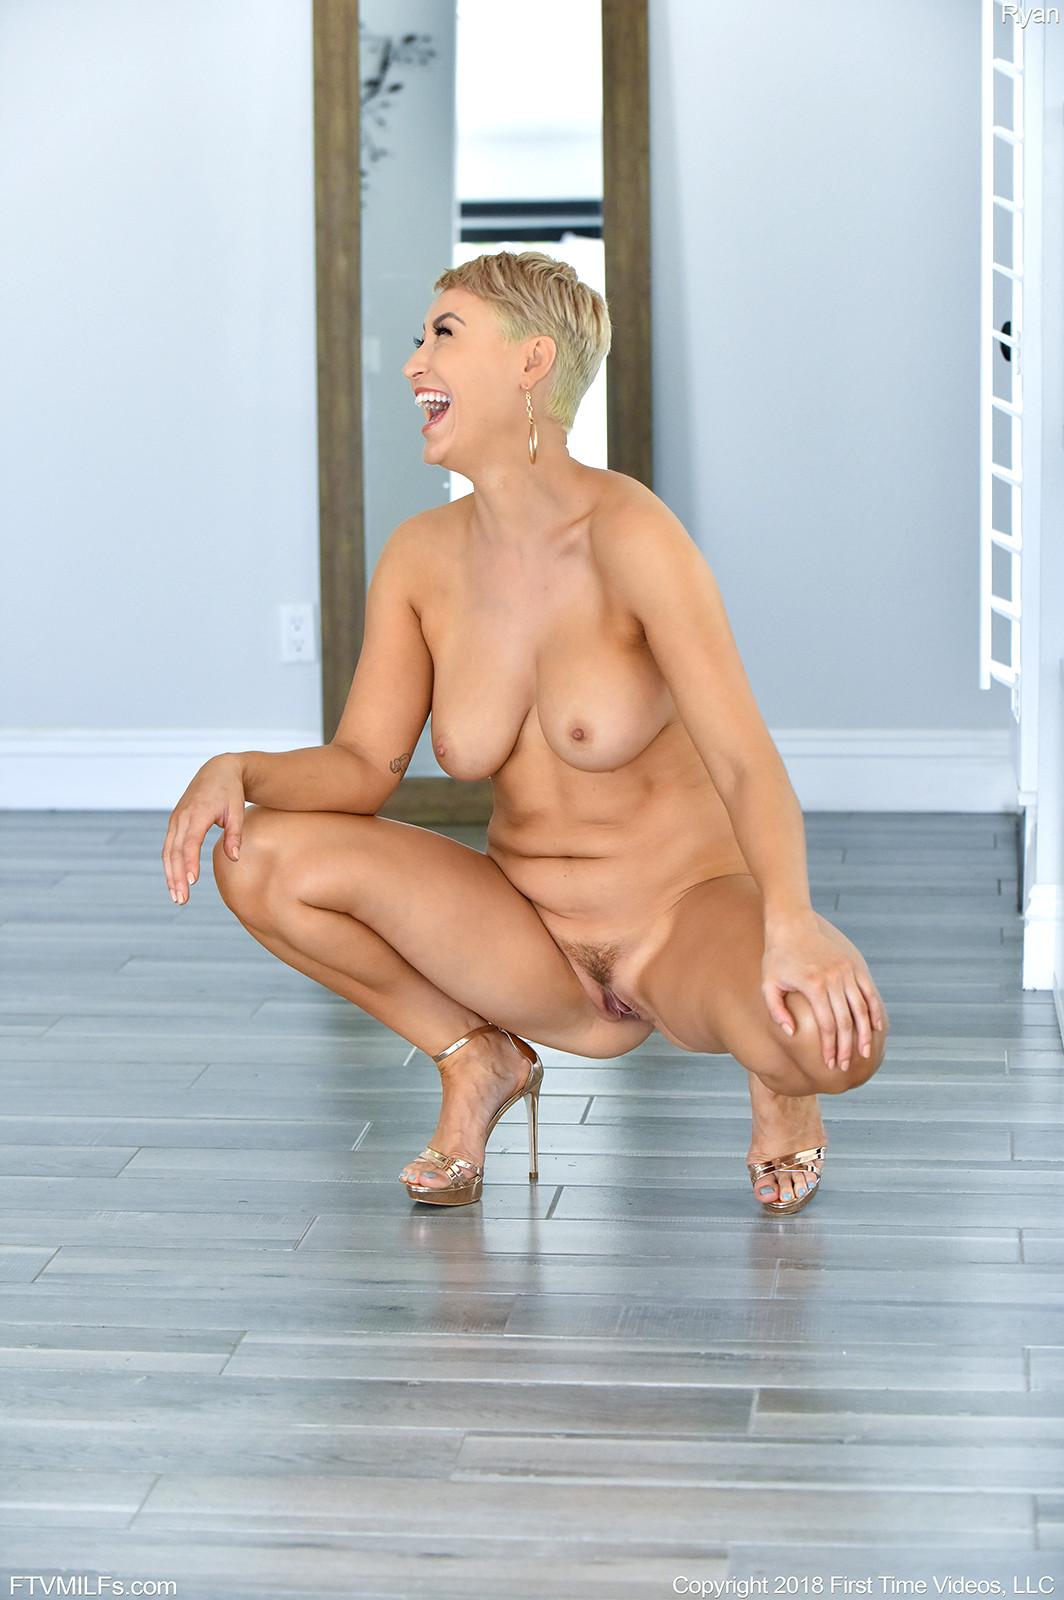 ftv milfs ryan keely miros nude posing doll toys sex hd pics